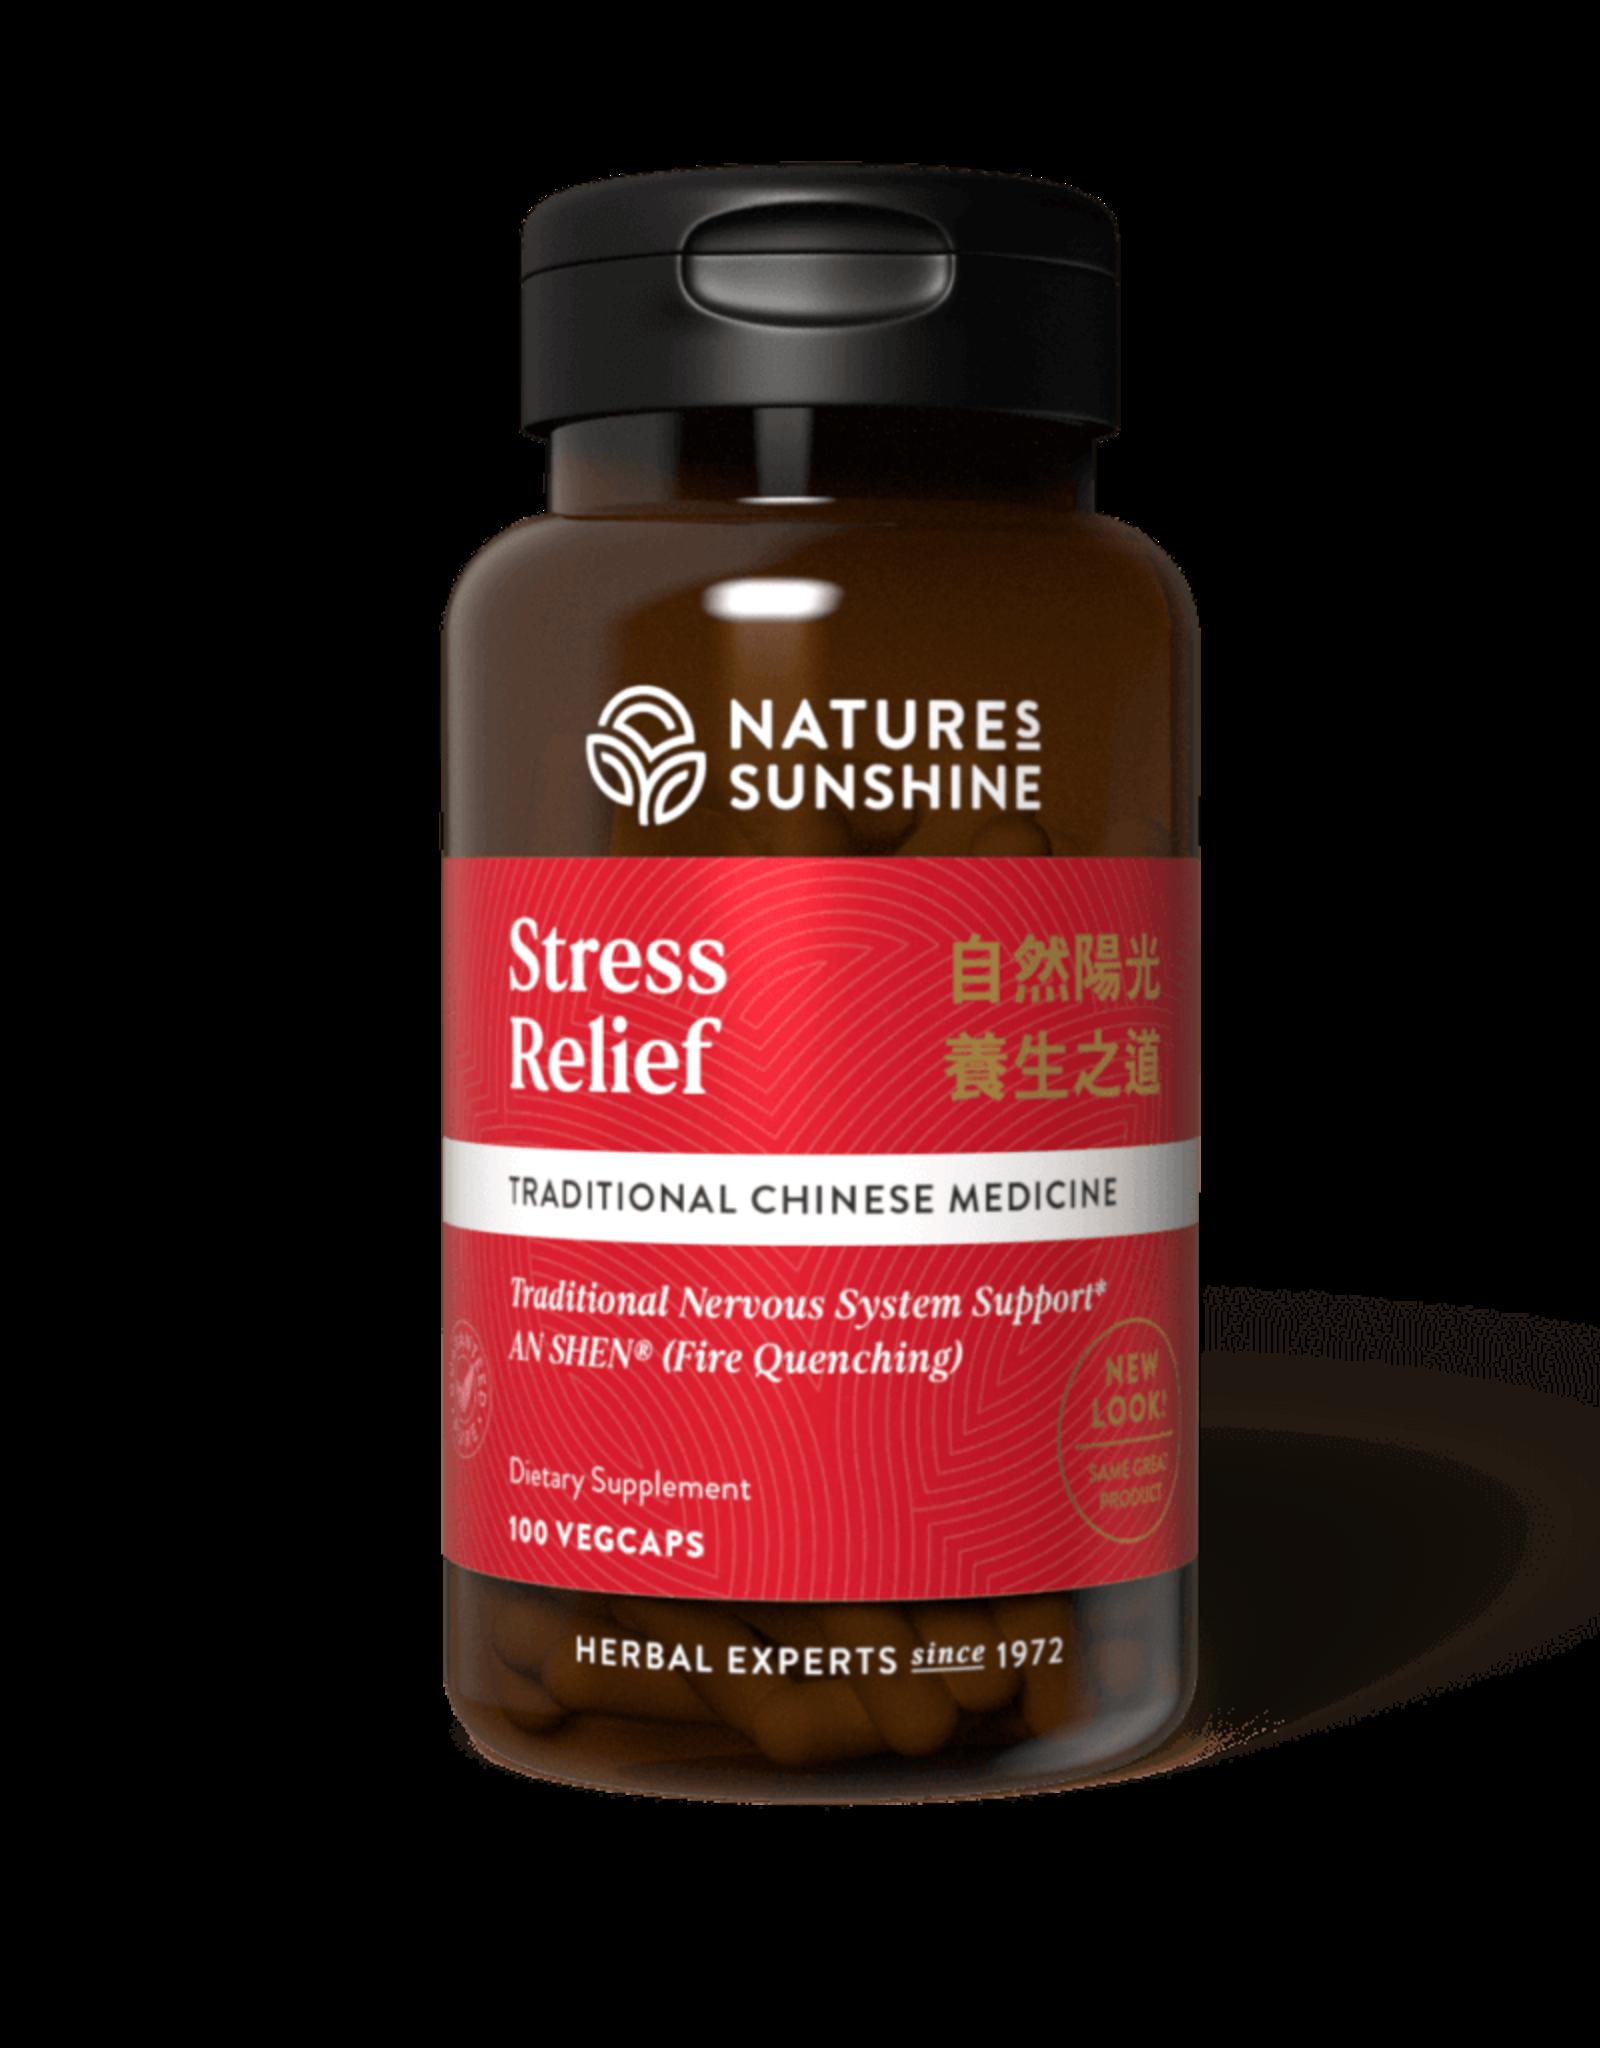 Nature's Sunshine Stress Relief (100 caps)